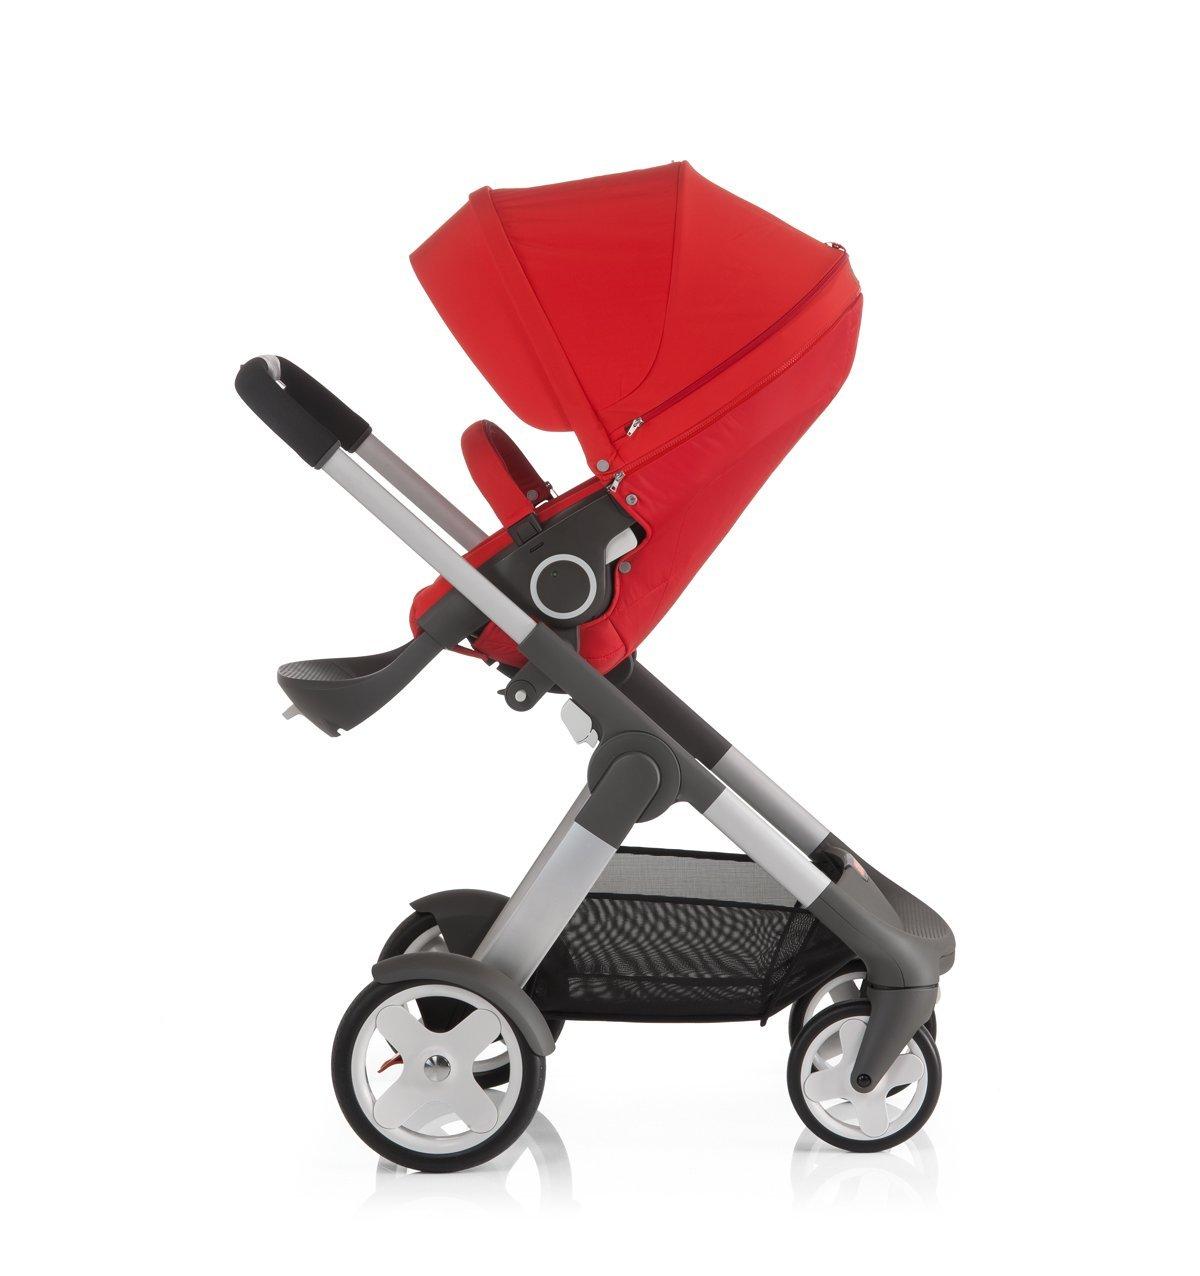 amazoncom  stokke crusi stroller  red  pram strollers  baby -